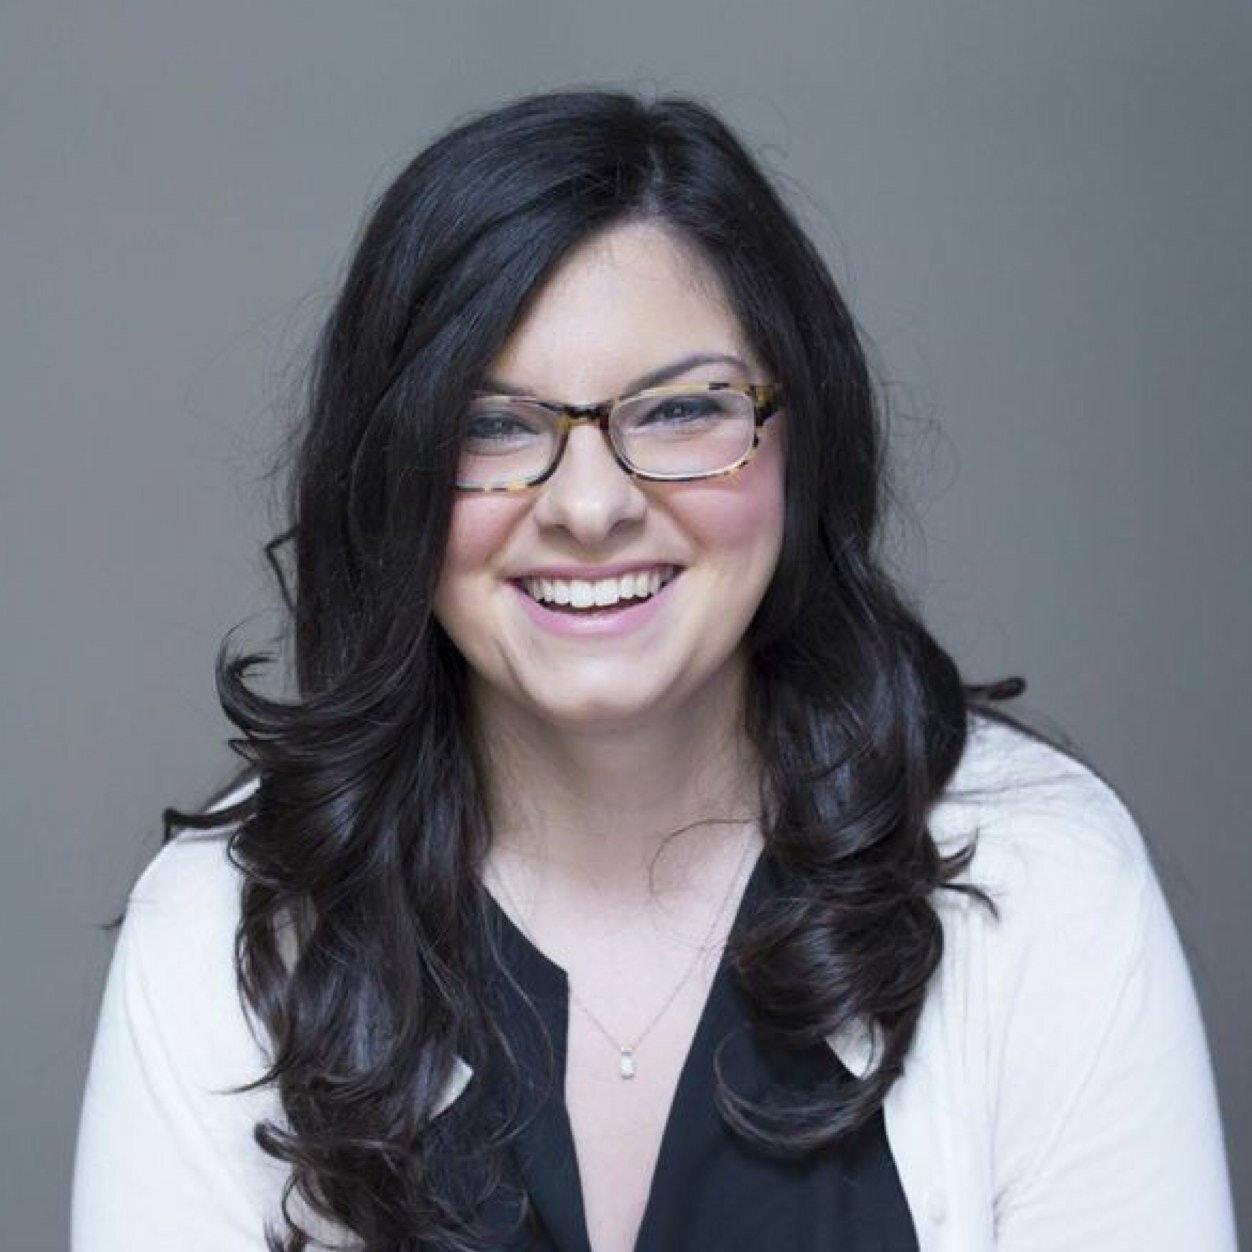 Erin Galarza